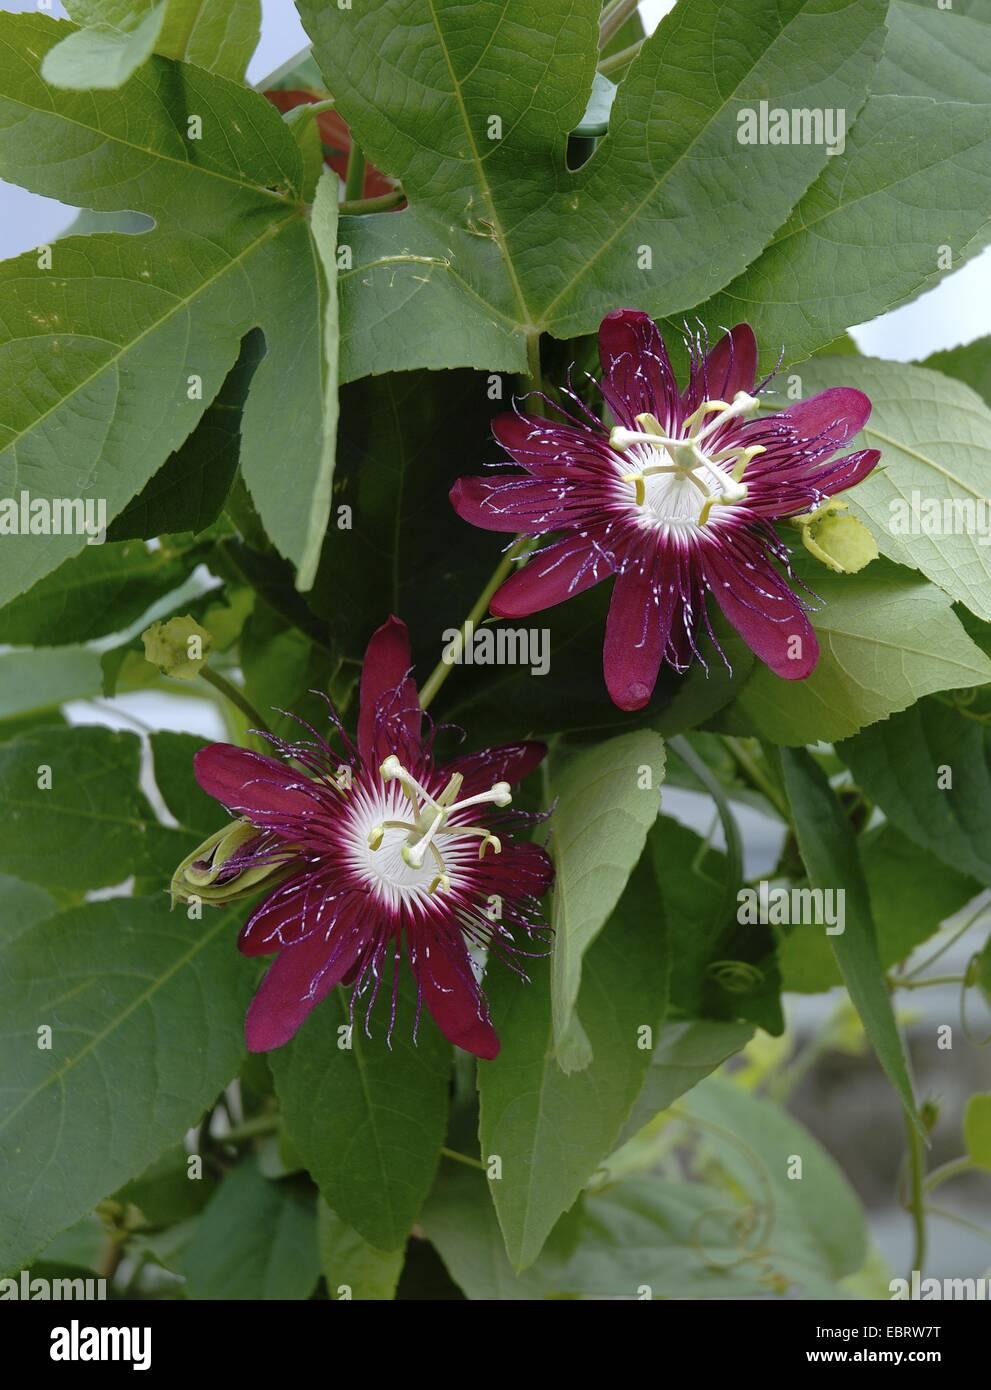 passion flower (Passiflora spec.), with crimson flowers - Stock Image